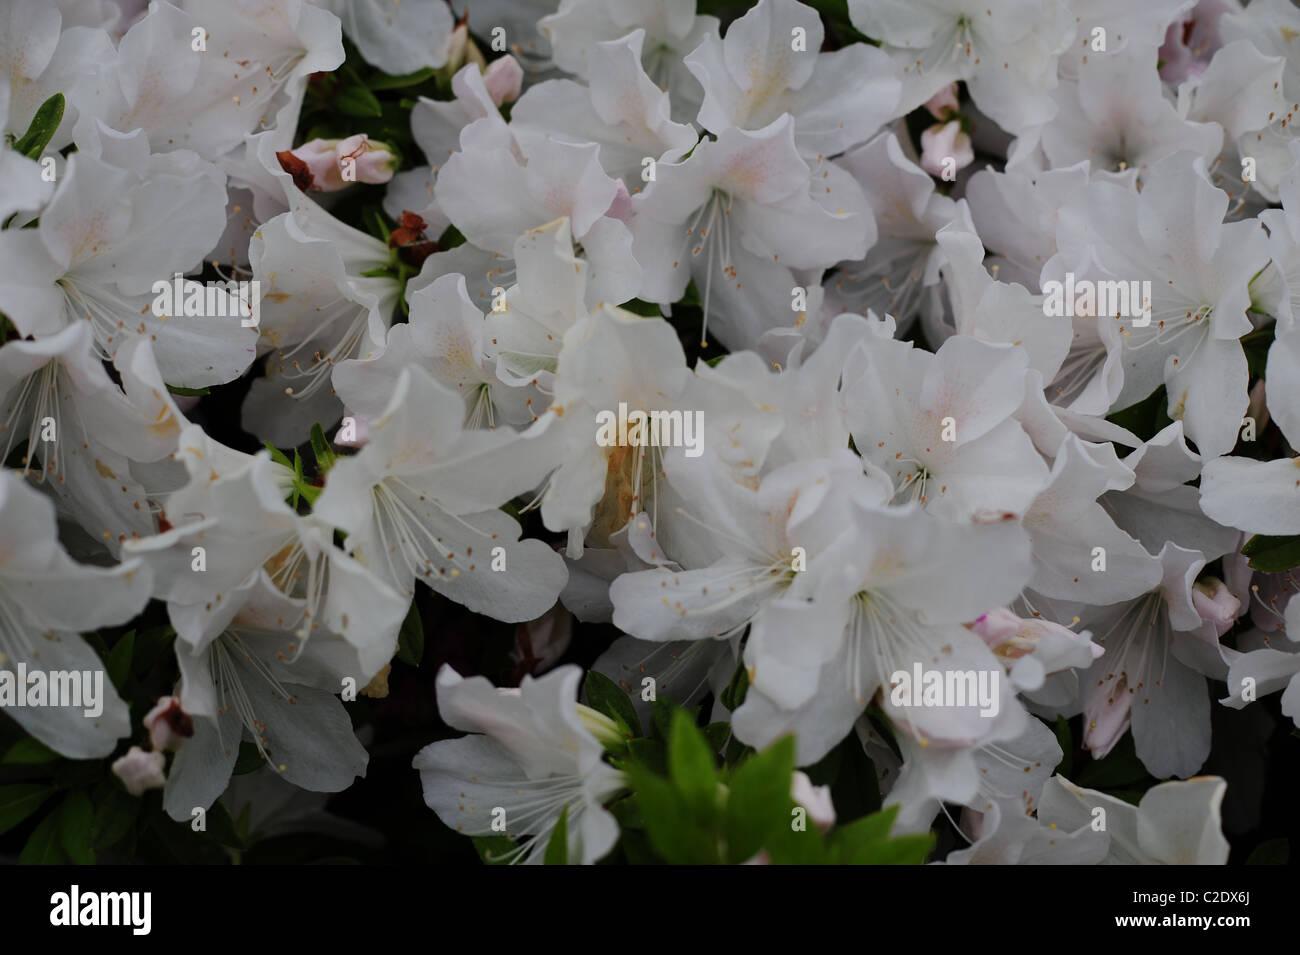 White Azaleas in bloom - Stock Image